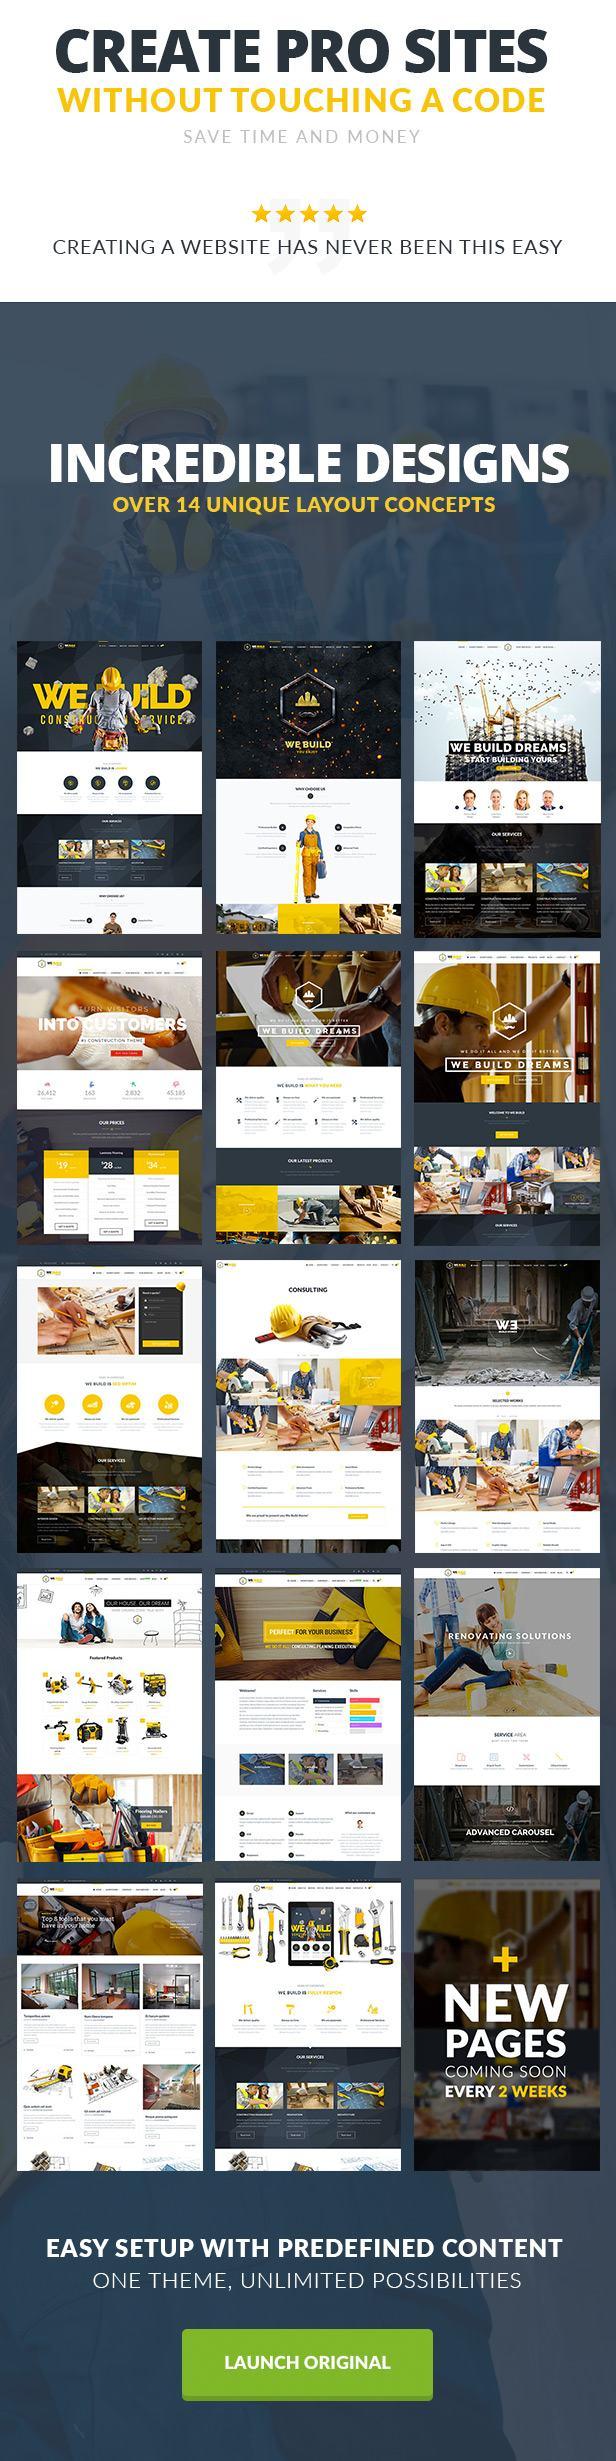 We Build - Construction WordPress Theme - 2